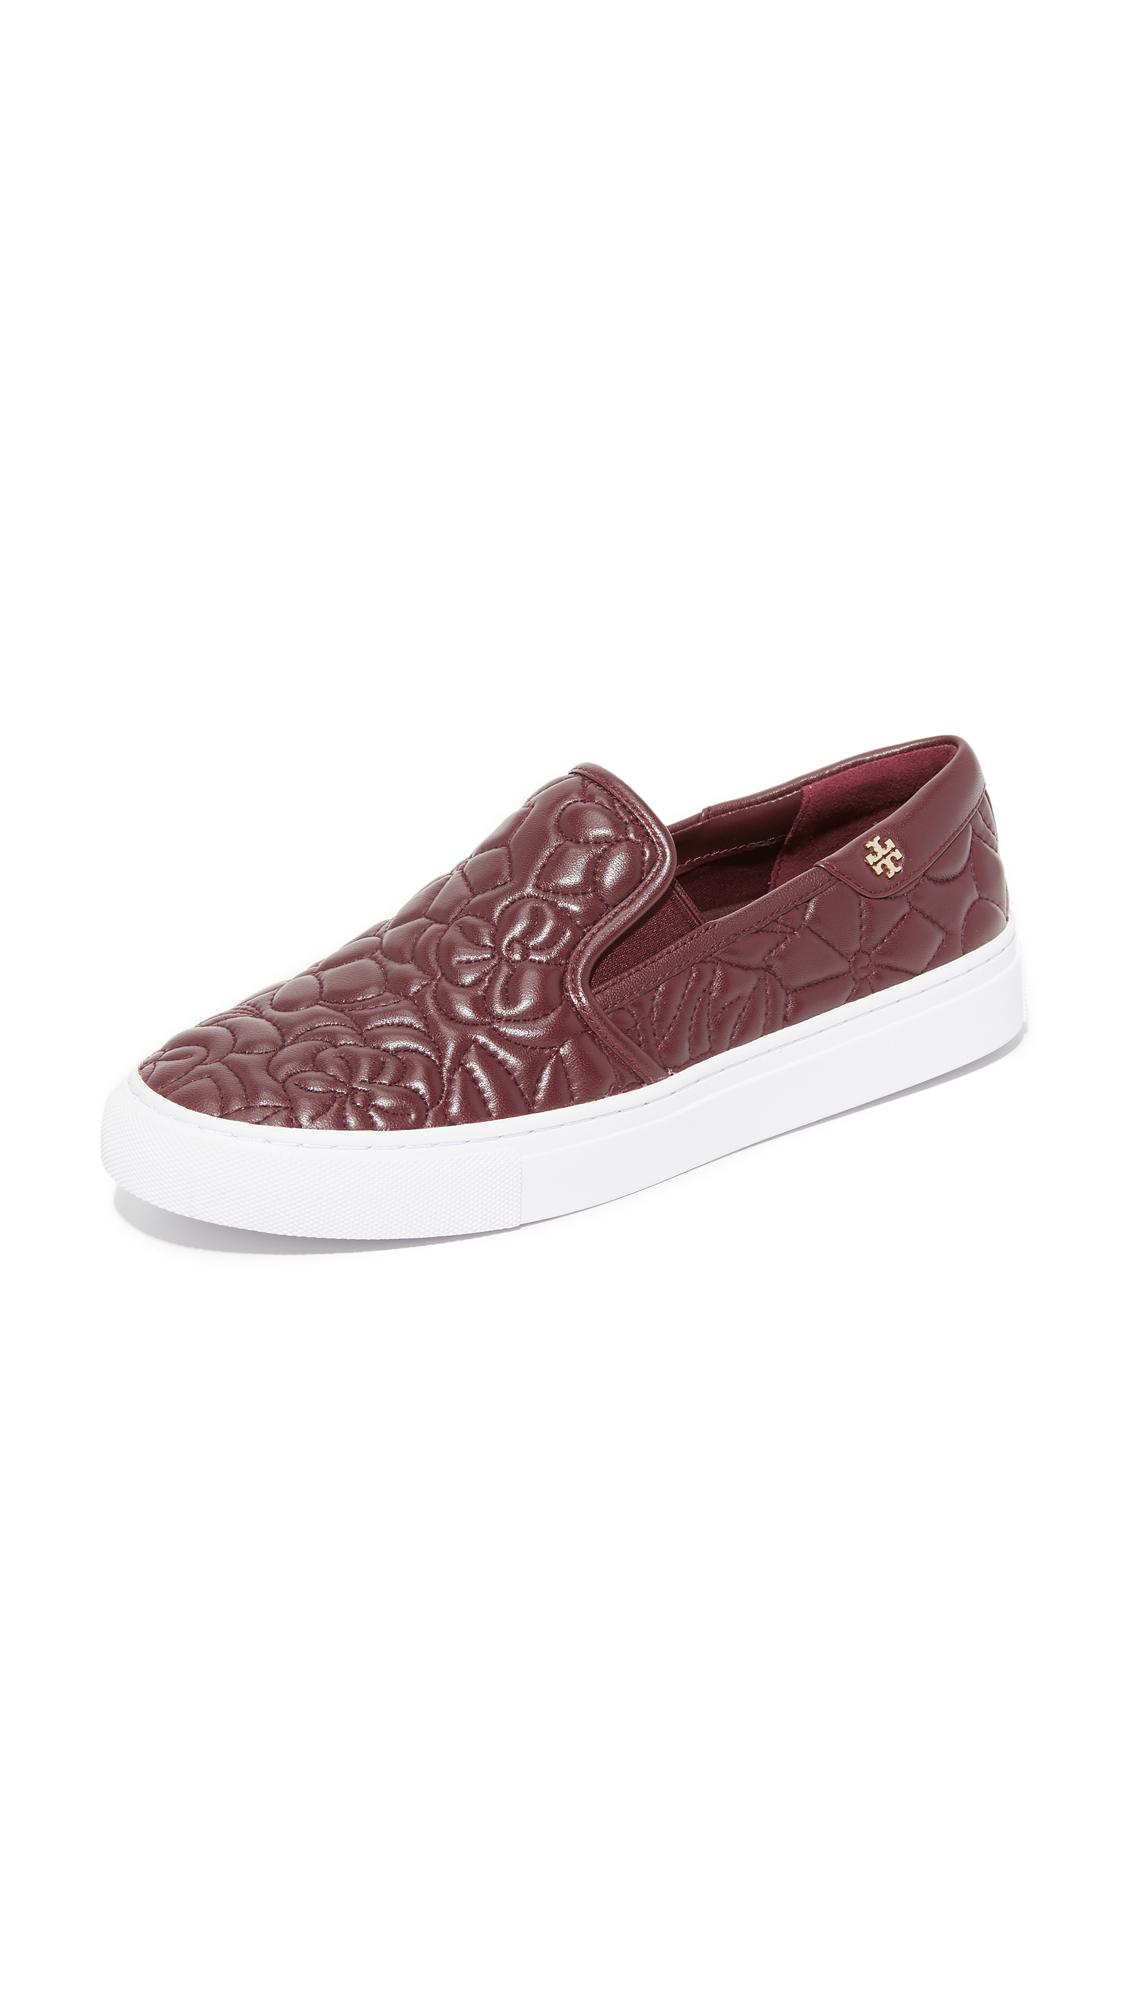 6dfbde0fa Tory burch sela slip on sneakers shopbop jpg 1128x2000 Tory burch slide ons